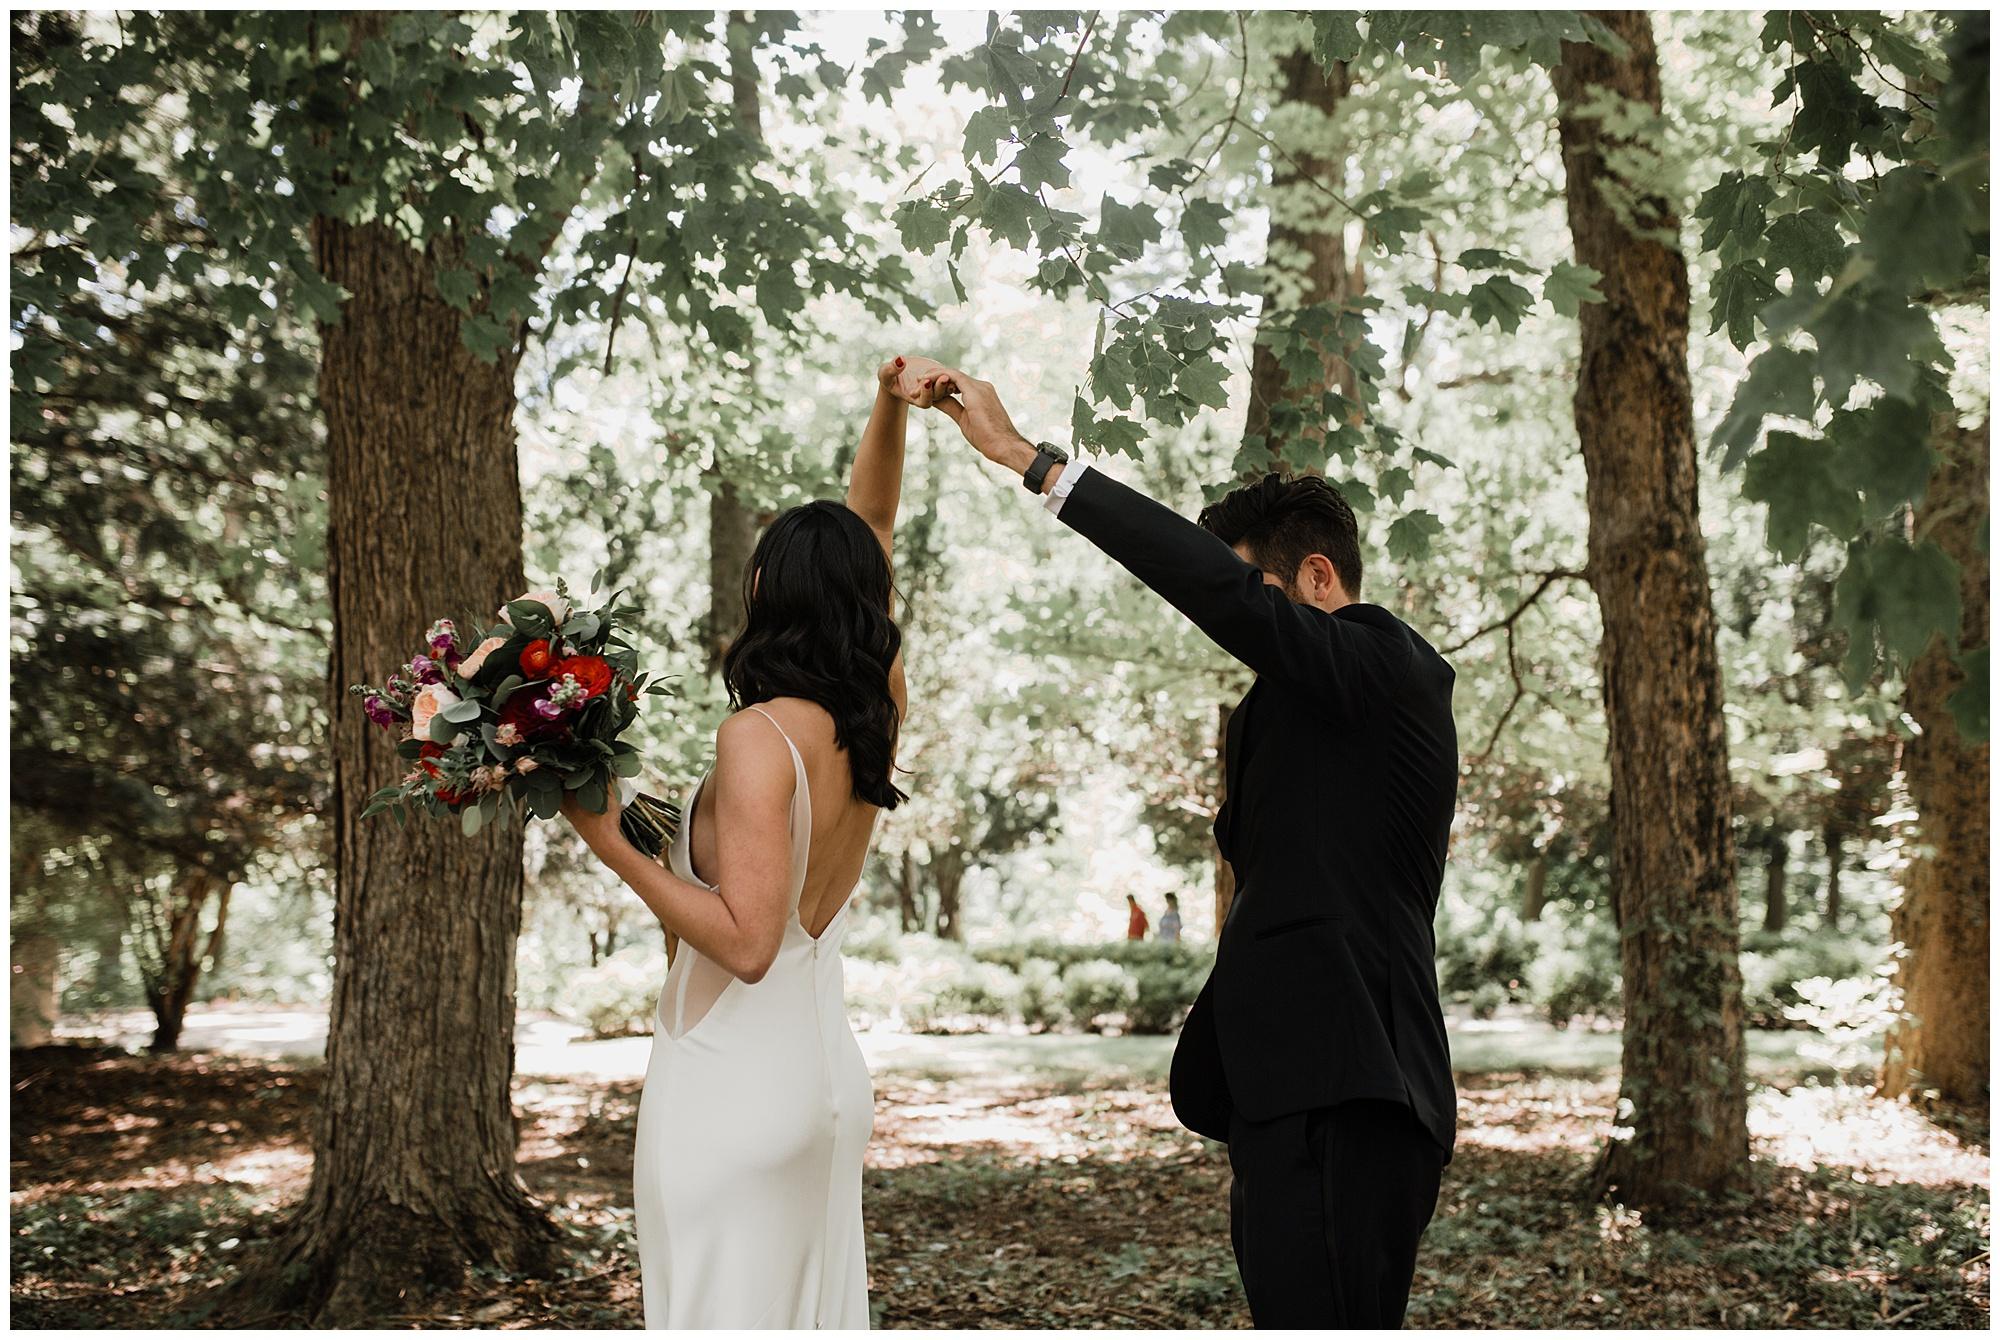 allerton_park_wedding_champaign_il_chicago_wright_photographs_ne_0052.jpg